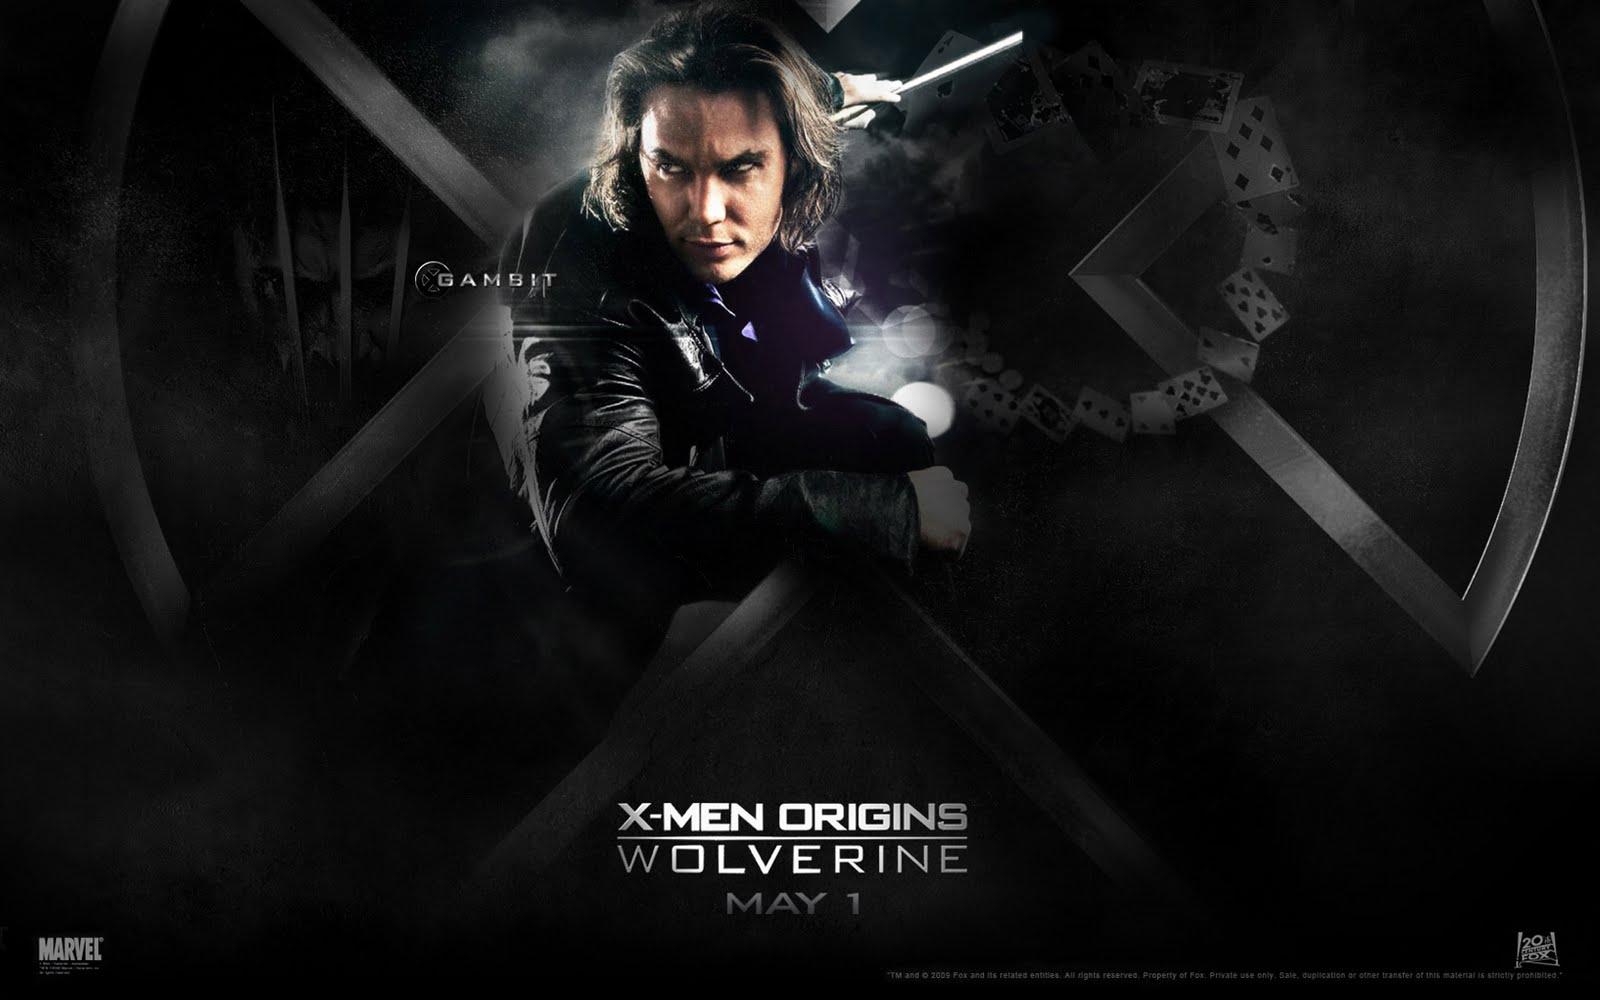 http://4.bp.blogspot.com/_nD_YgZuOadA/TI2w9mt-XrI/AAAAAAAAAjg/GRN9AUxV3lk/s1600/wolverine_1680_Gambit.jpg